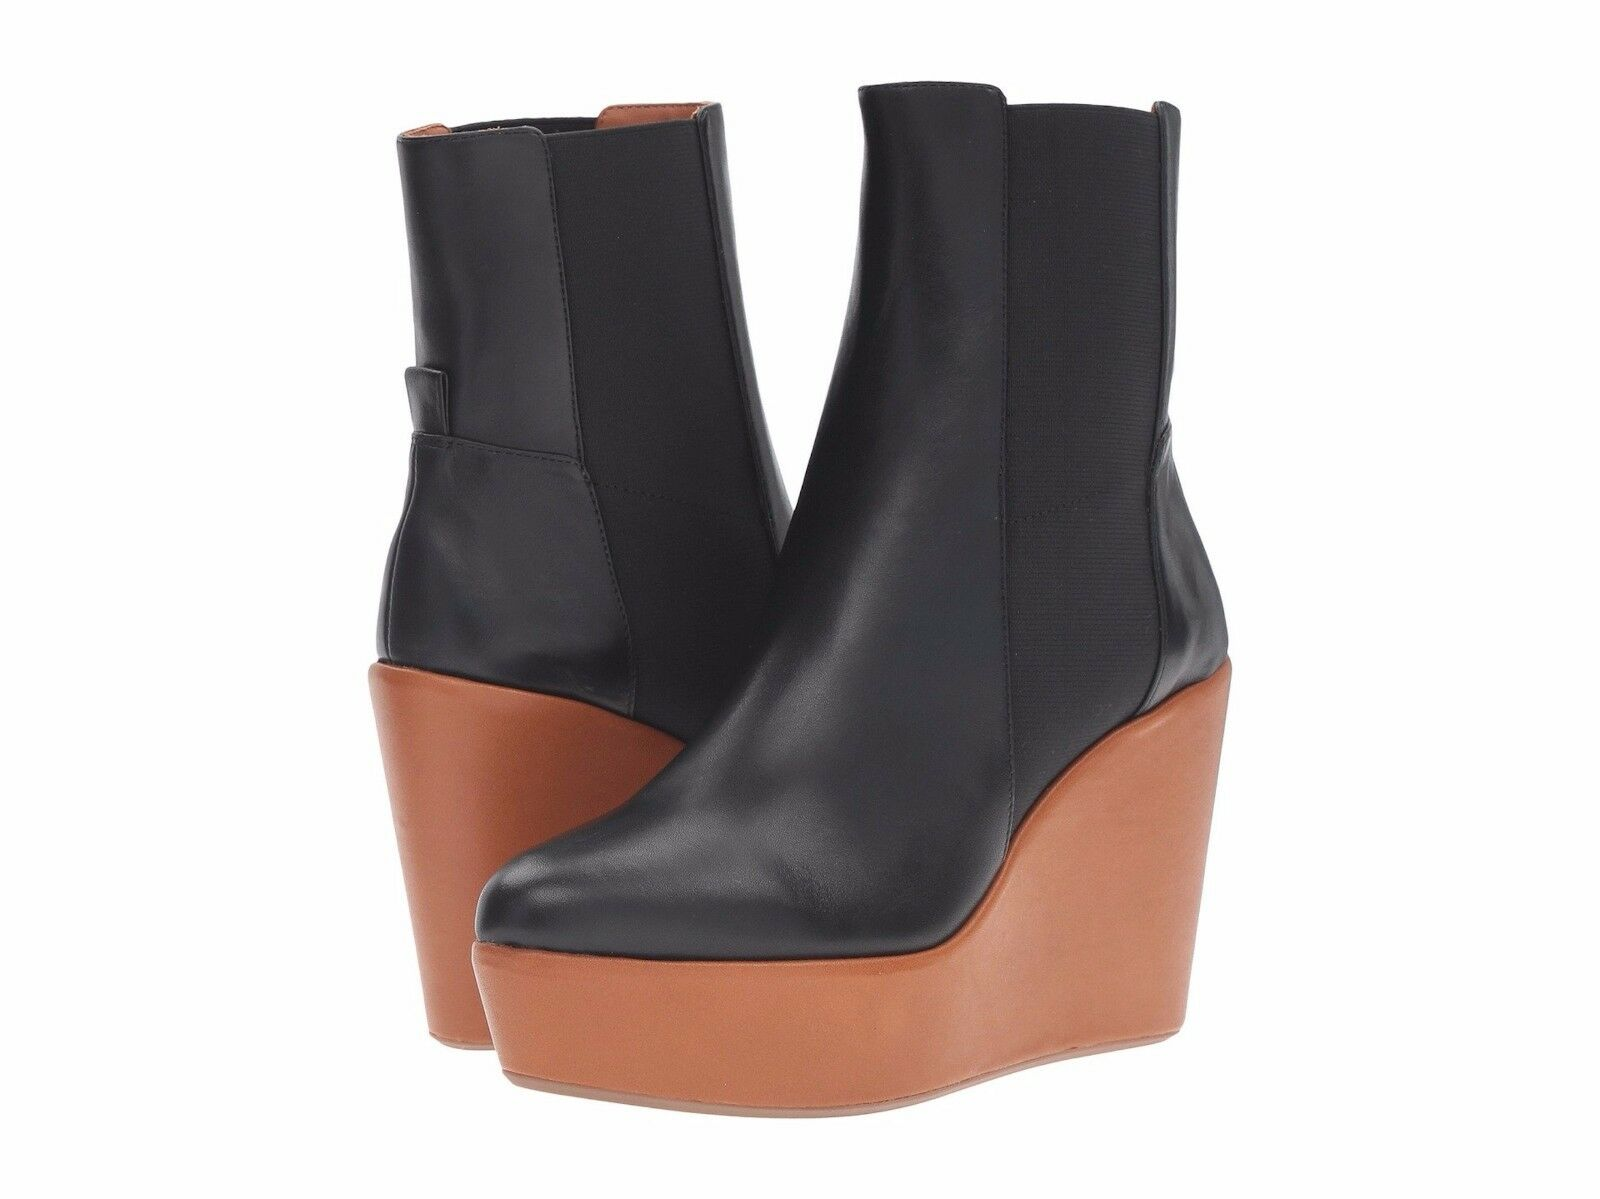 Derek Lam 10 Crosby Sandy Too Wedge Leather Ankle Bootie Boot Black 395 NEW